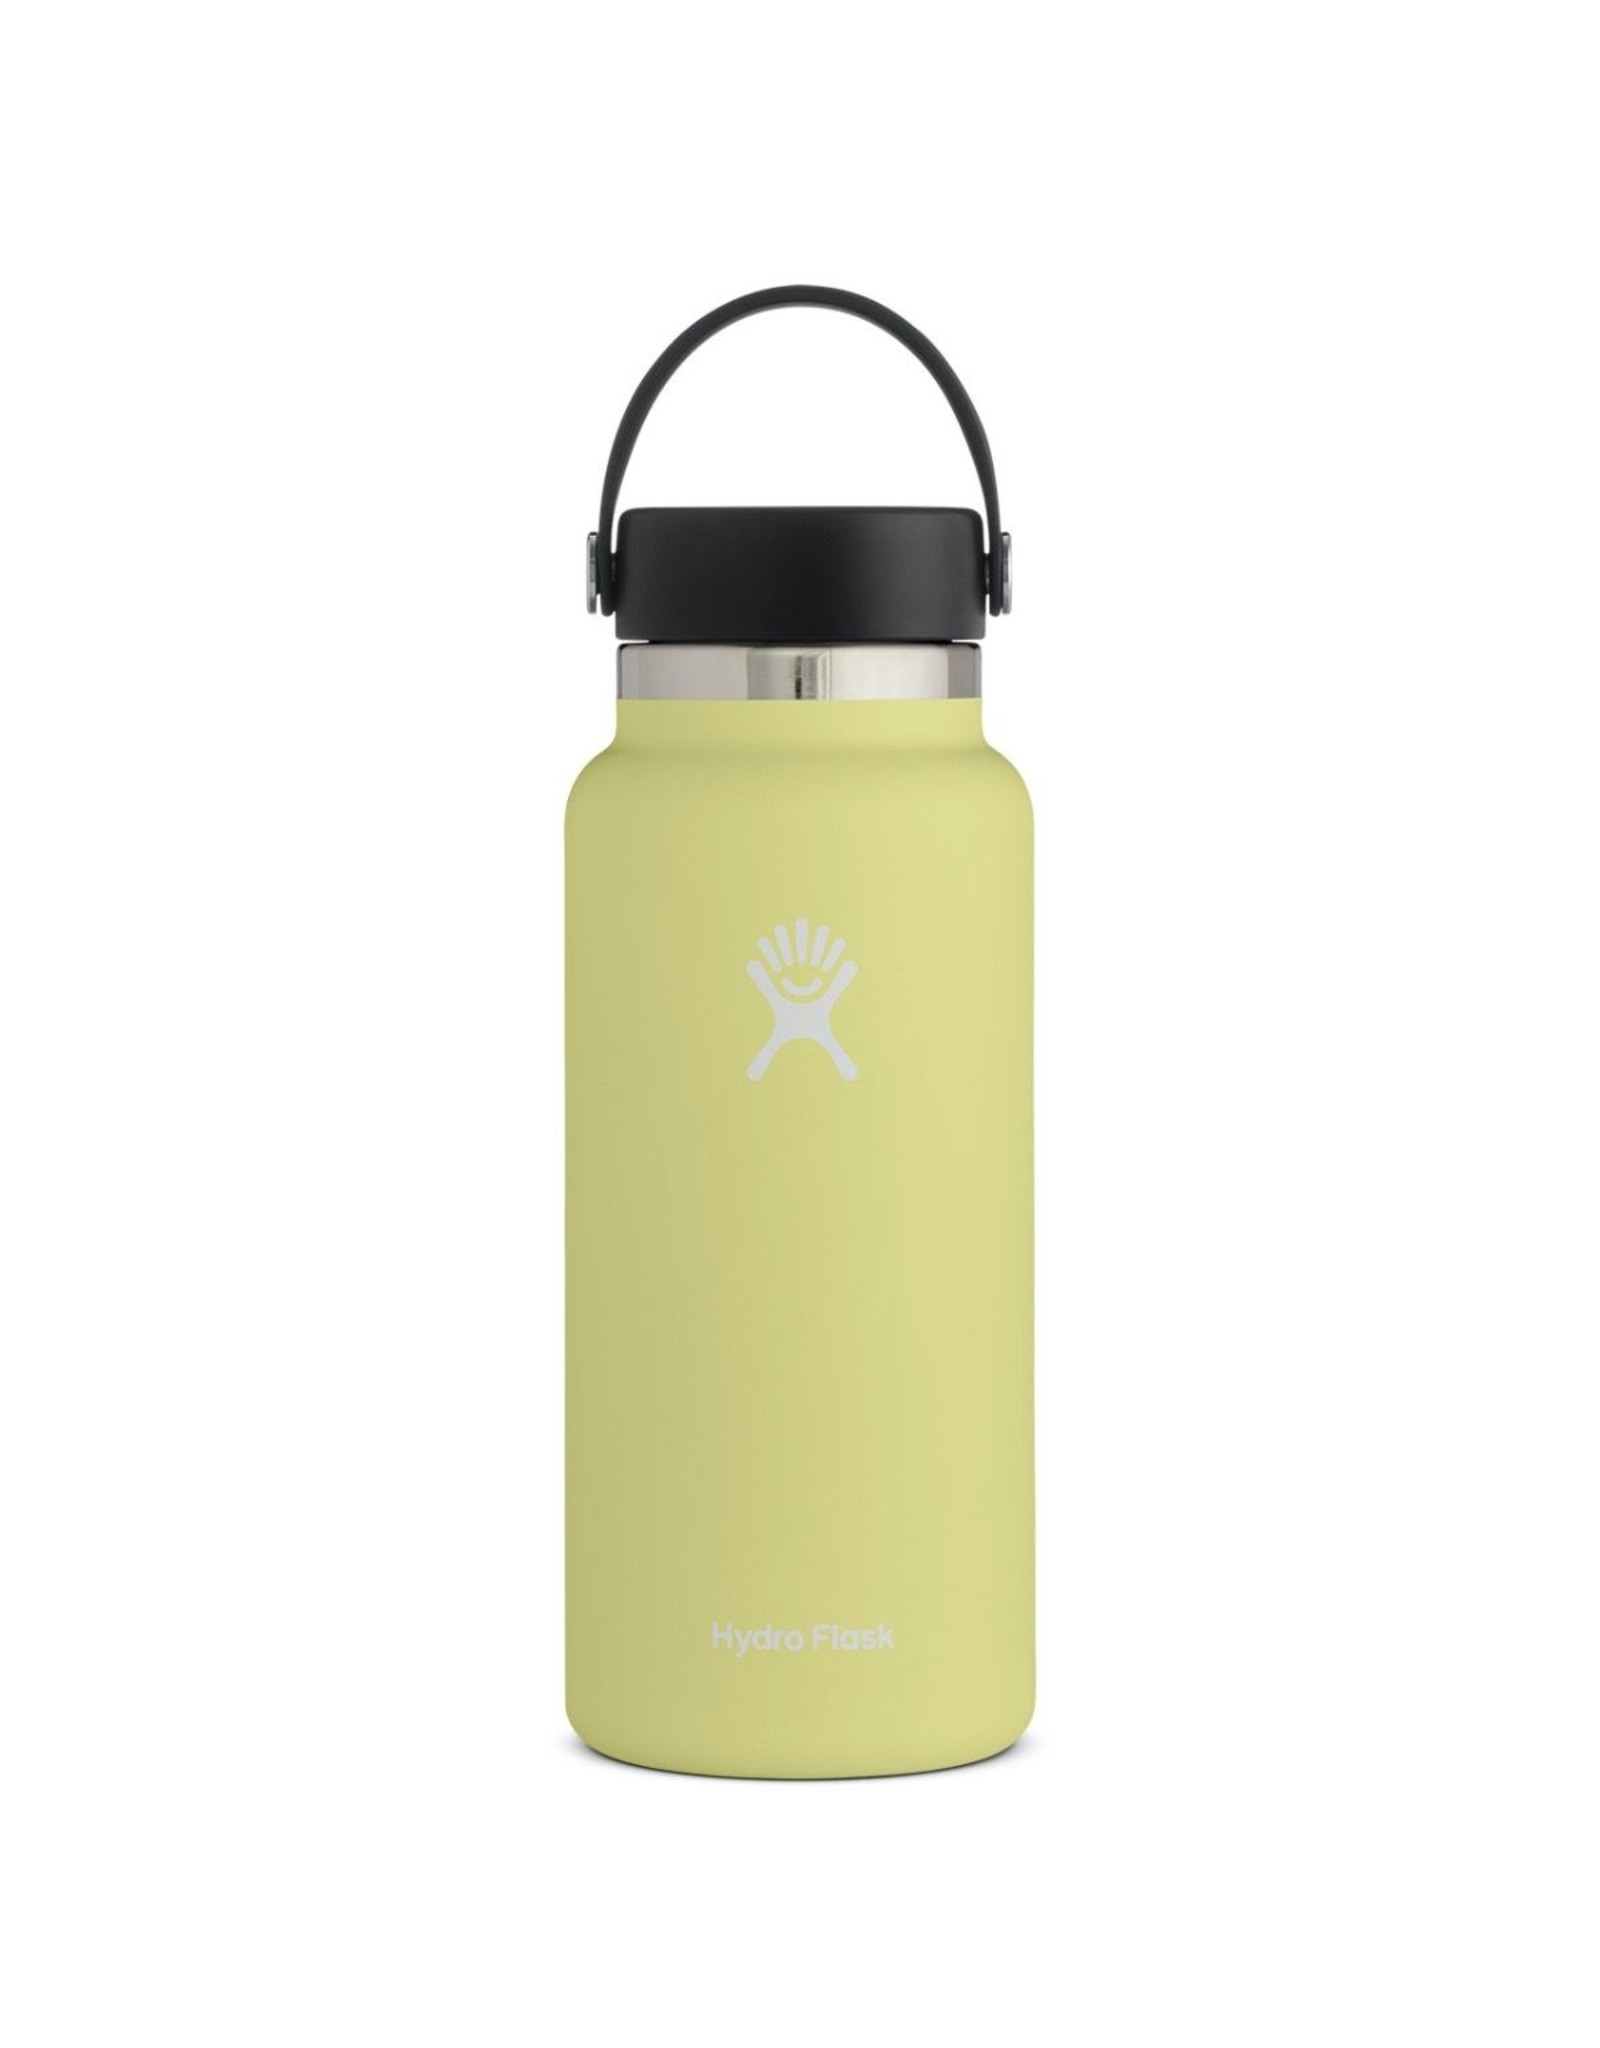 Hydro Flask Hydro Flask 32oz Wide Mouth w/ Flex Cap Pineapple